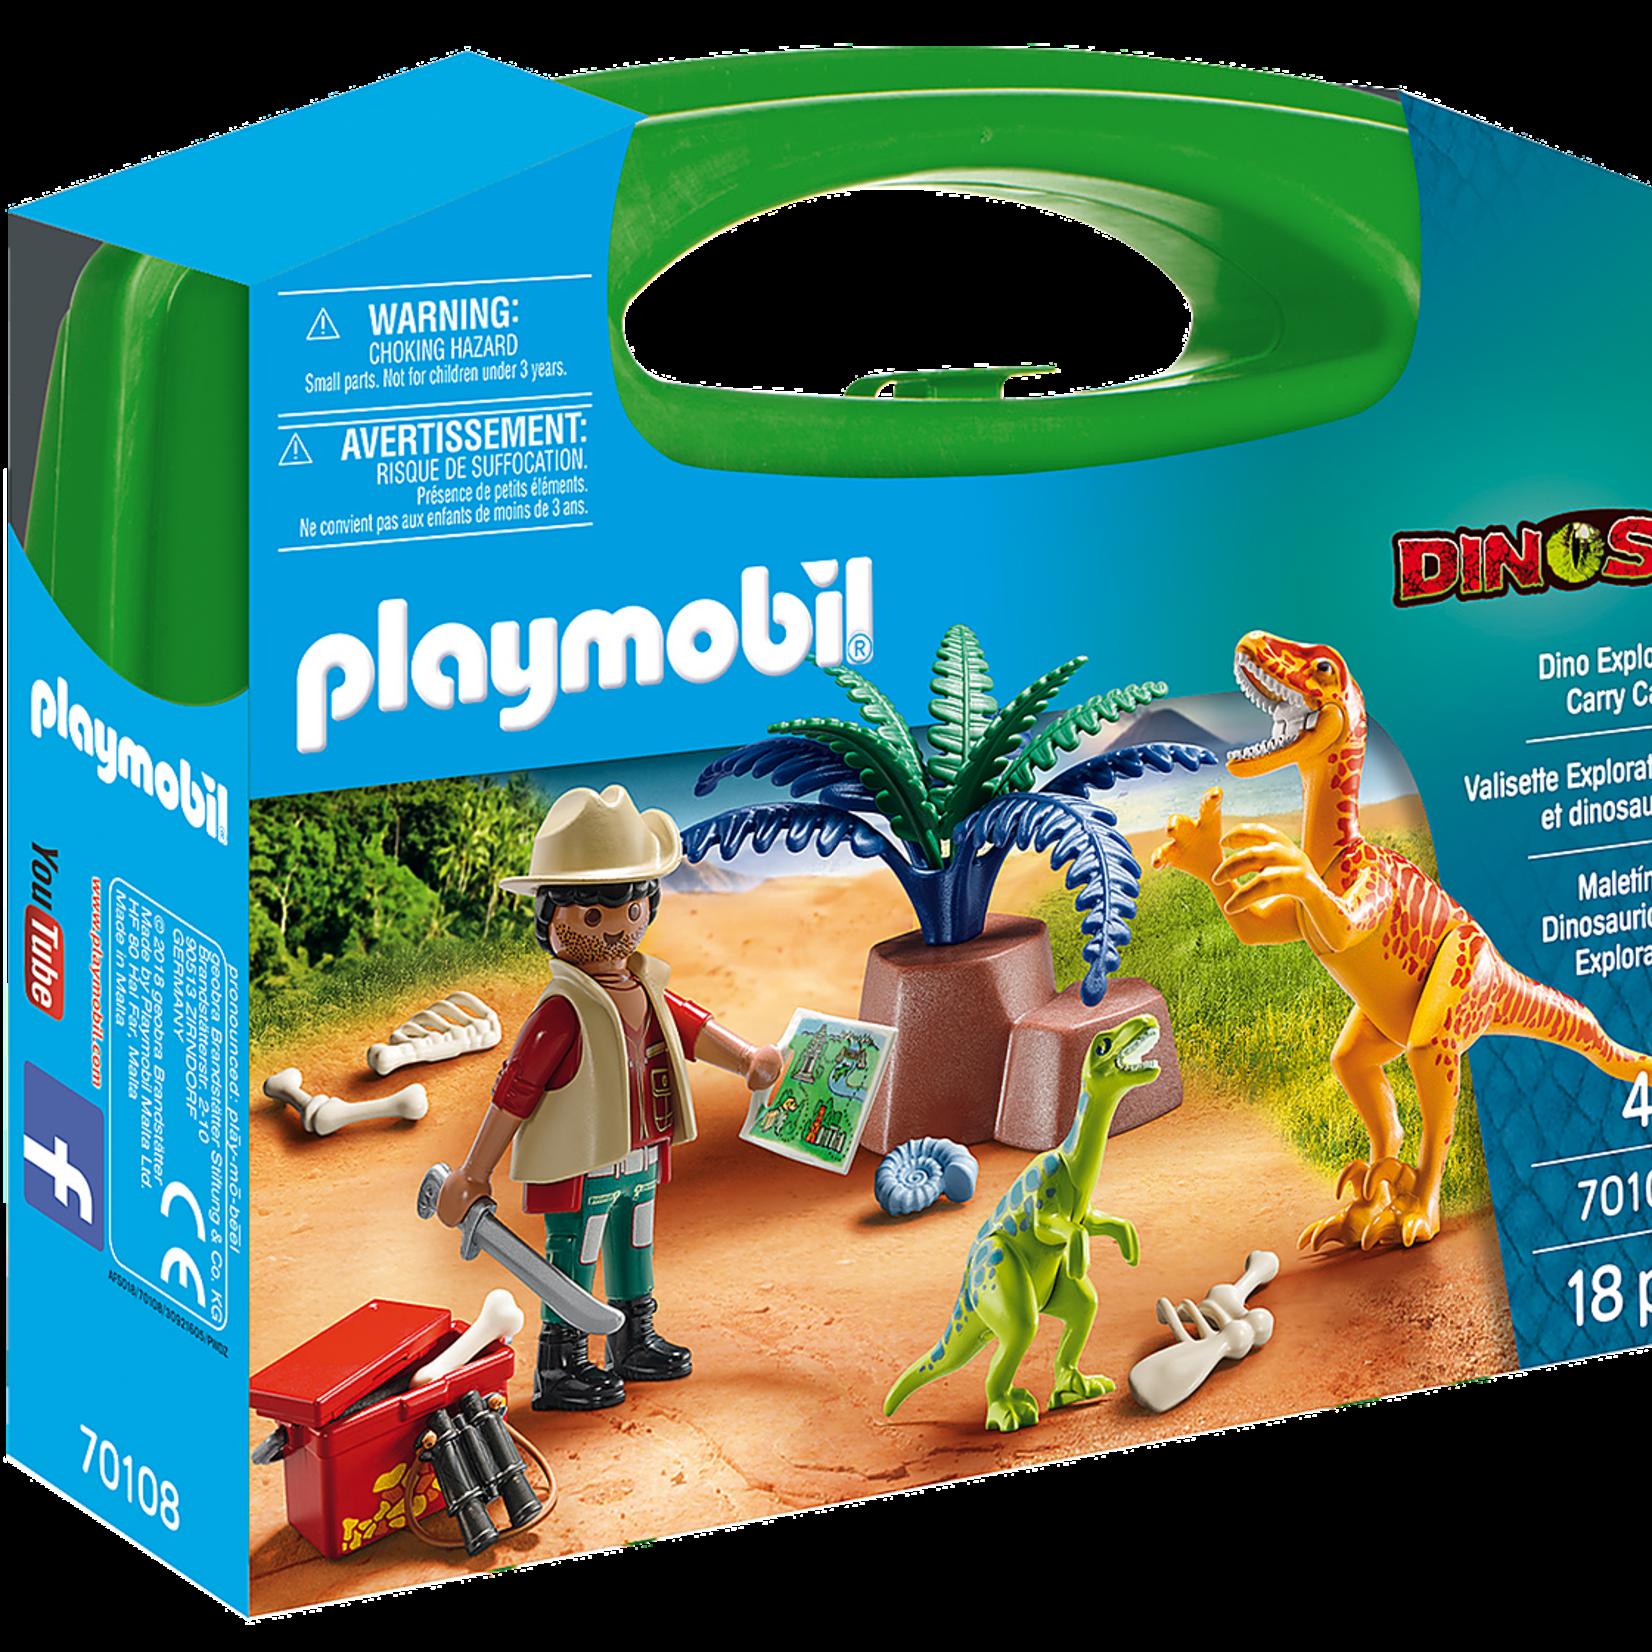 Playmobil Dino Explorer Carry Case - Playmobil 70108